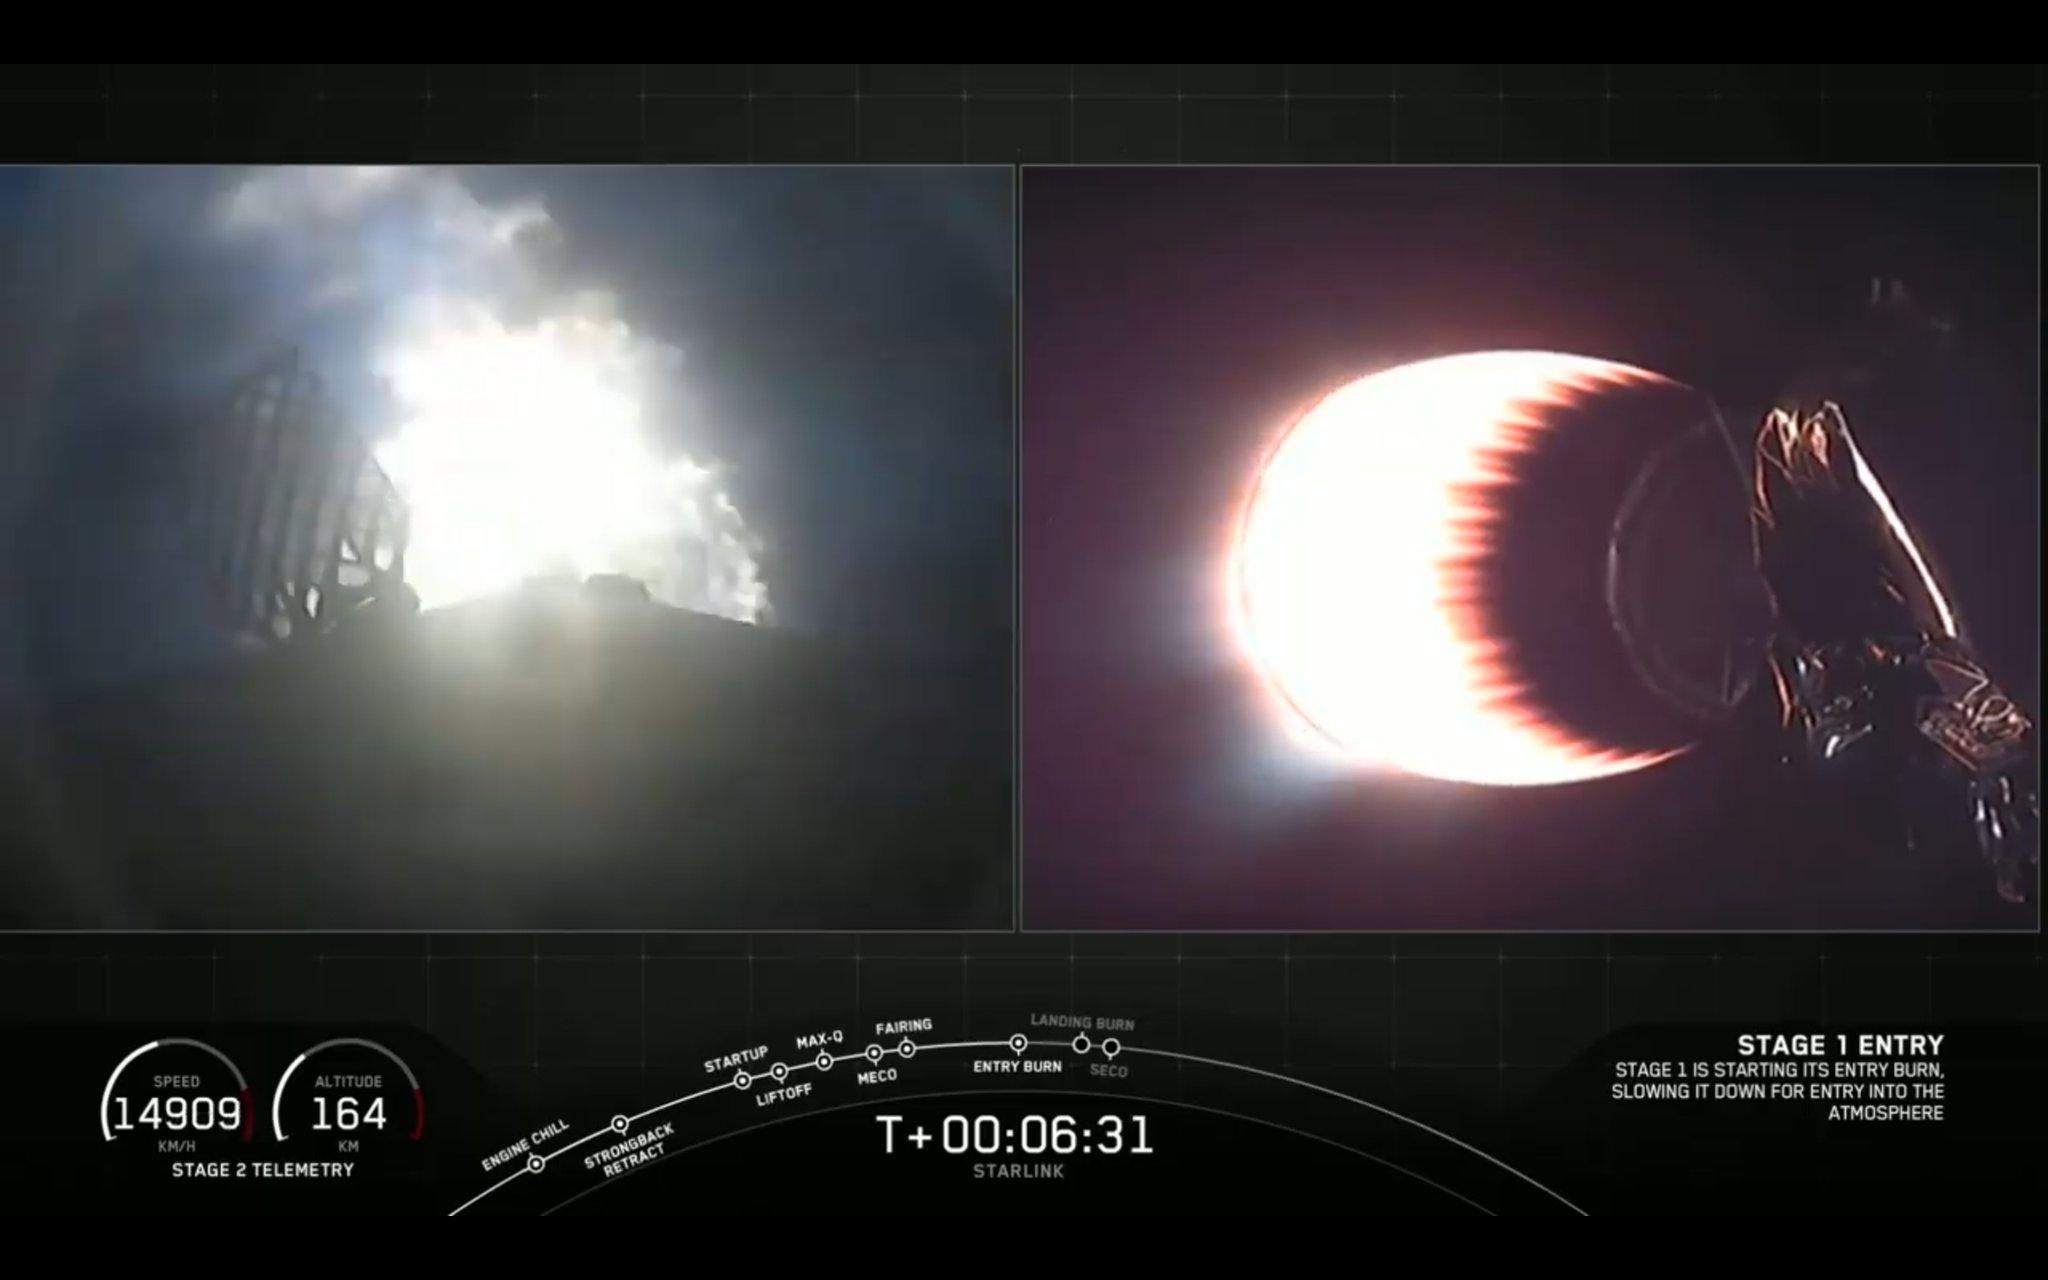 Falcon 9 (Starlink v1.0 L9 + BlackSky Global) - KSC - 7.8.2020 - Page 4 3_jfif21